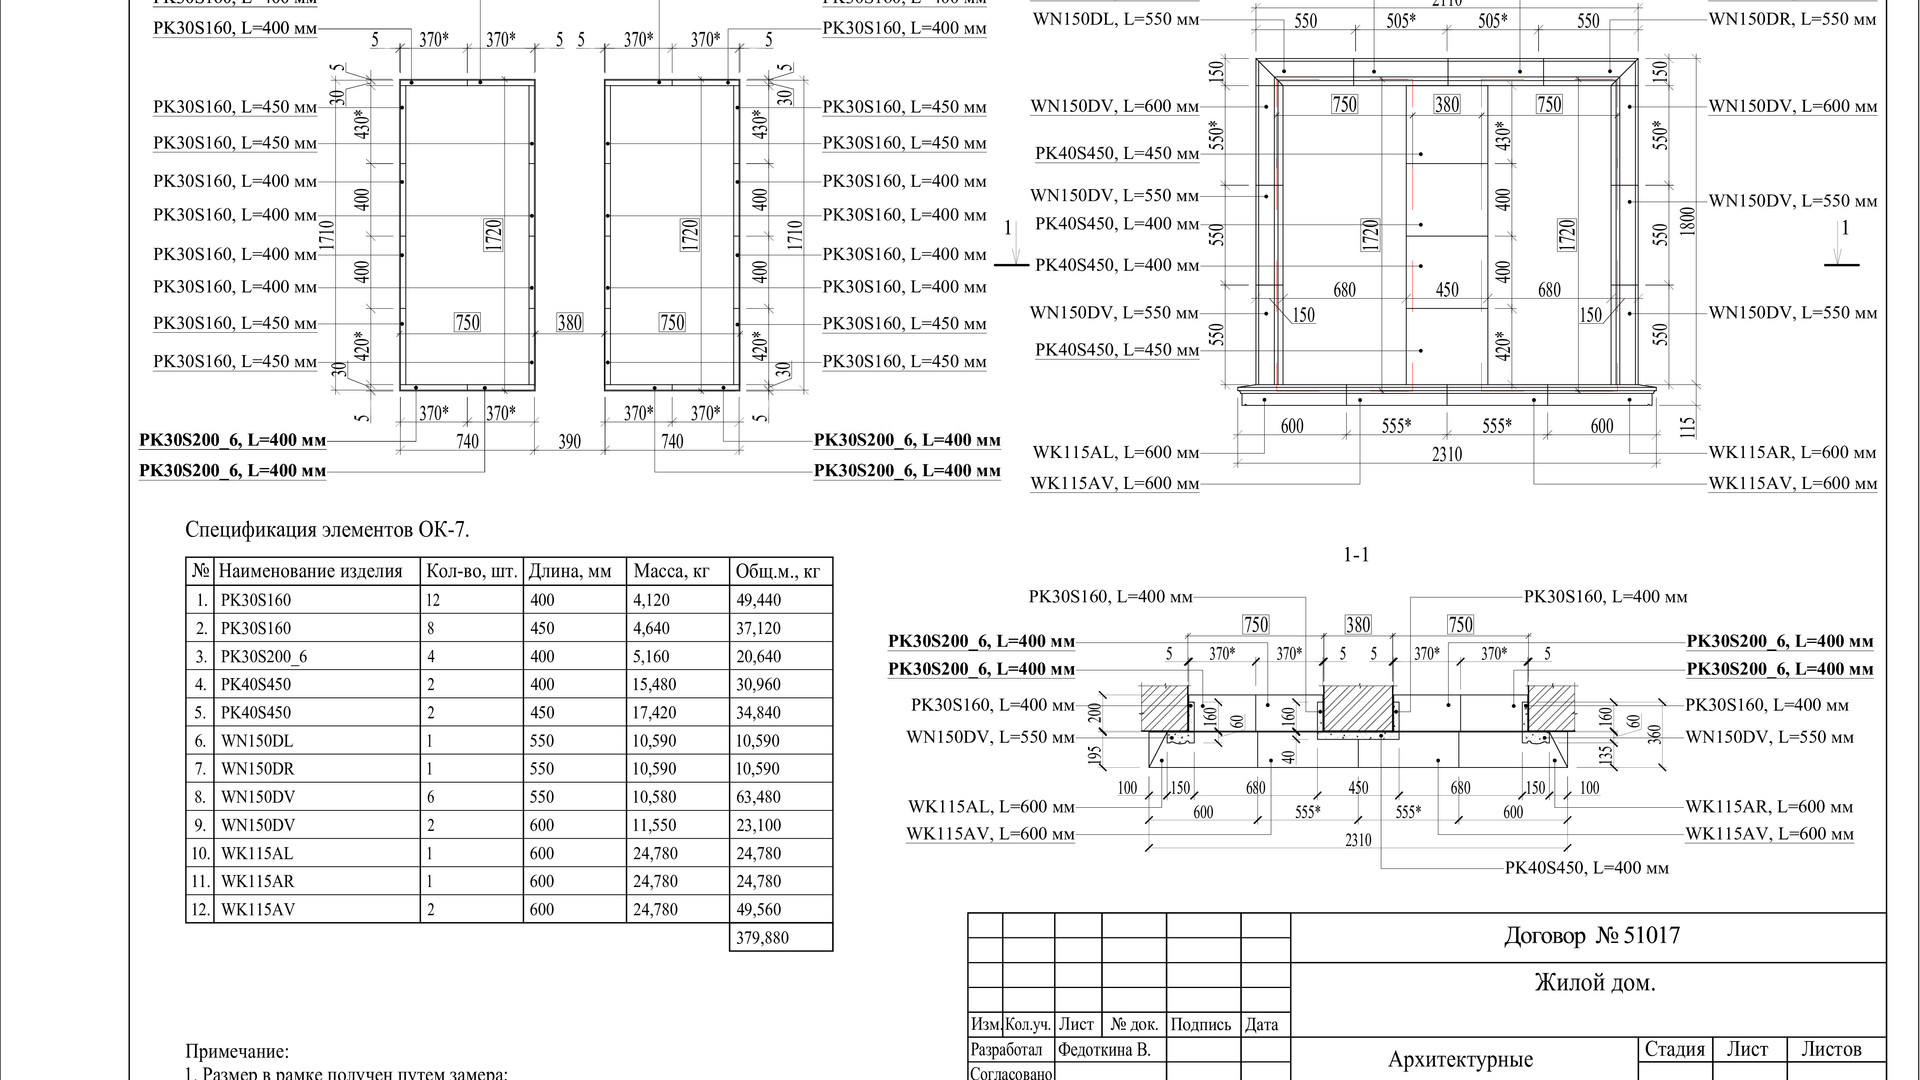 4. 16 лист_А3 (pdf.io).jpg